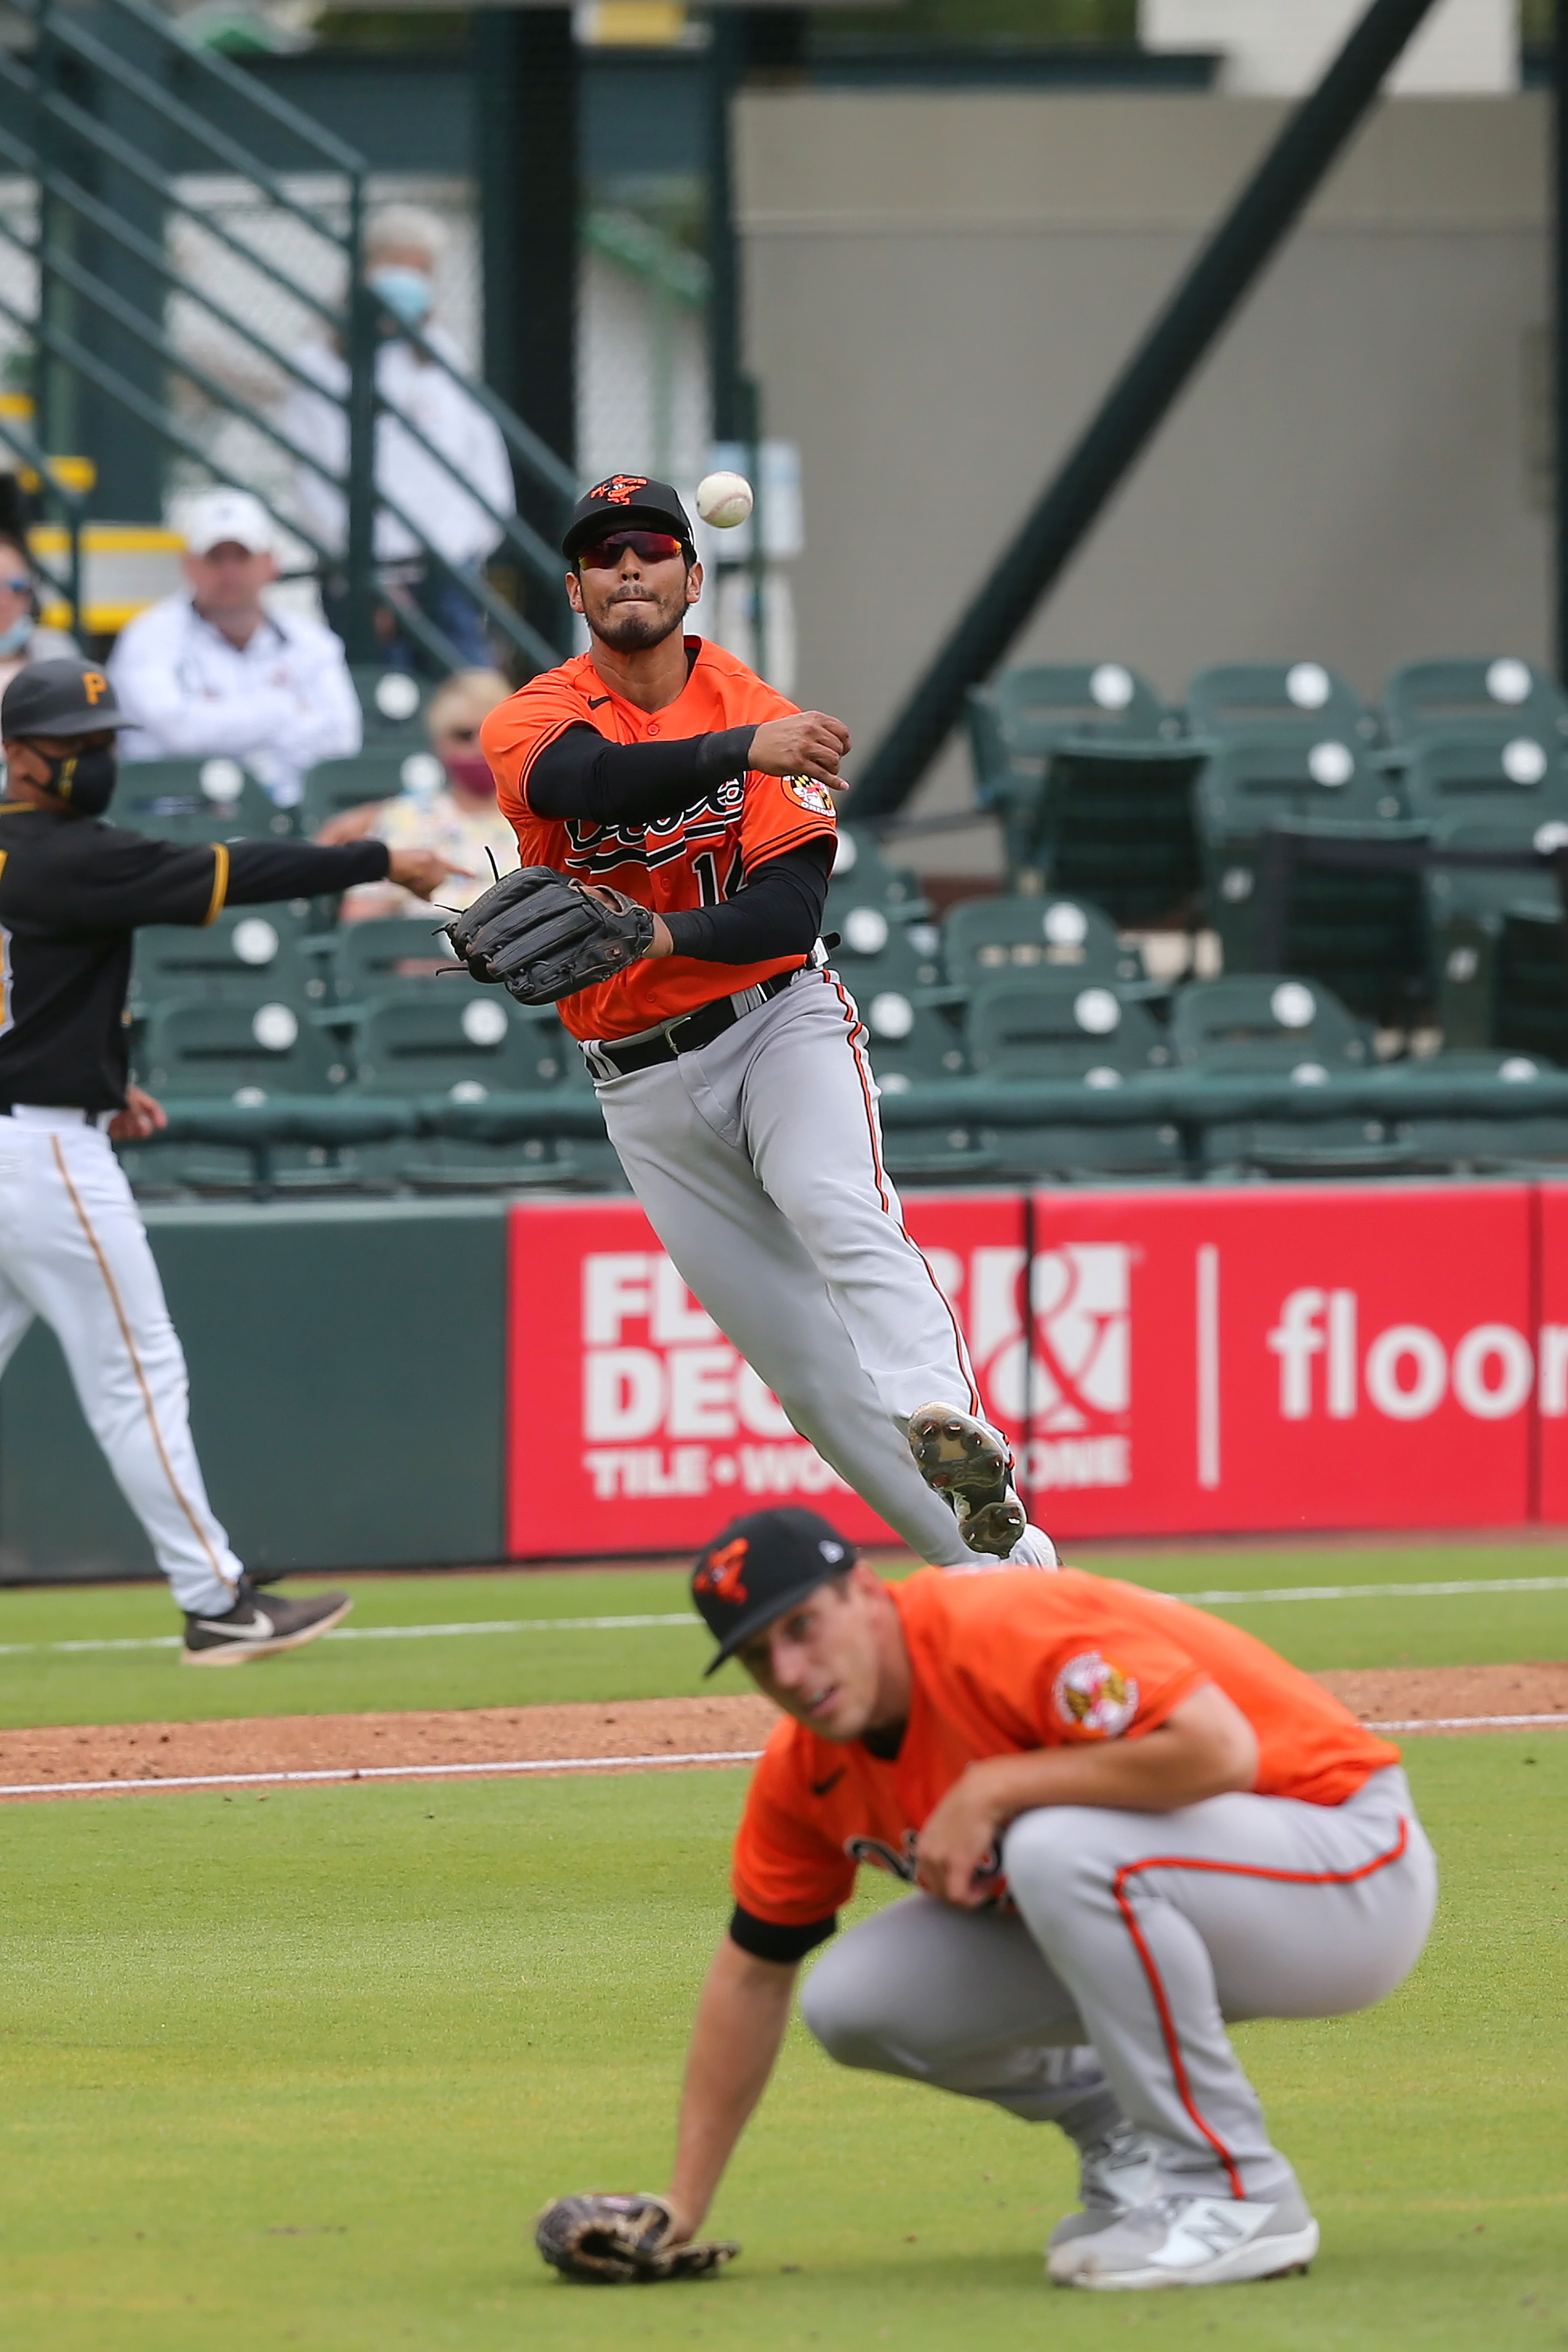 MLB: MAR 22 Spring Training - Orioles at Pirates